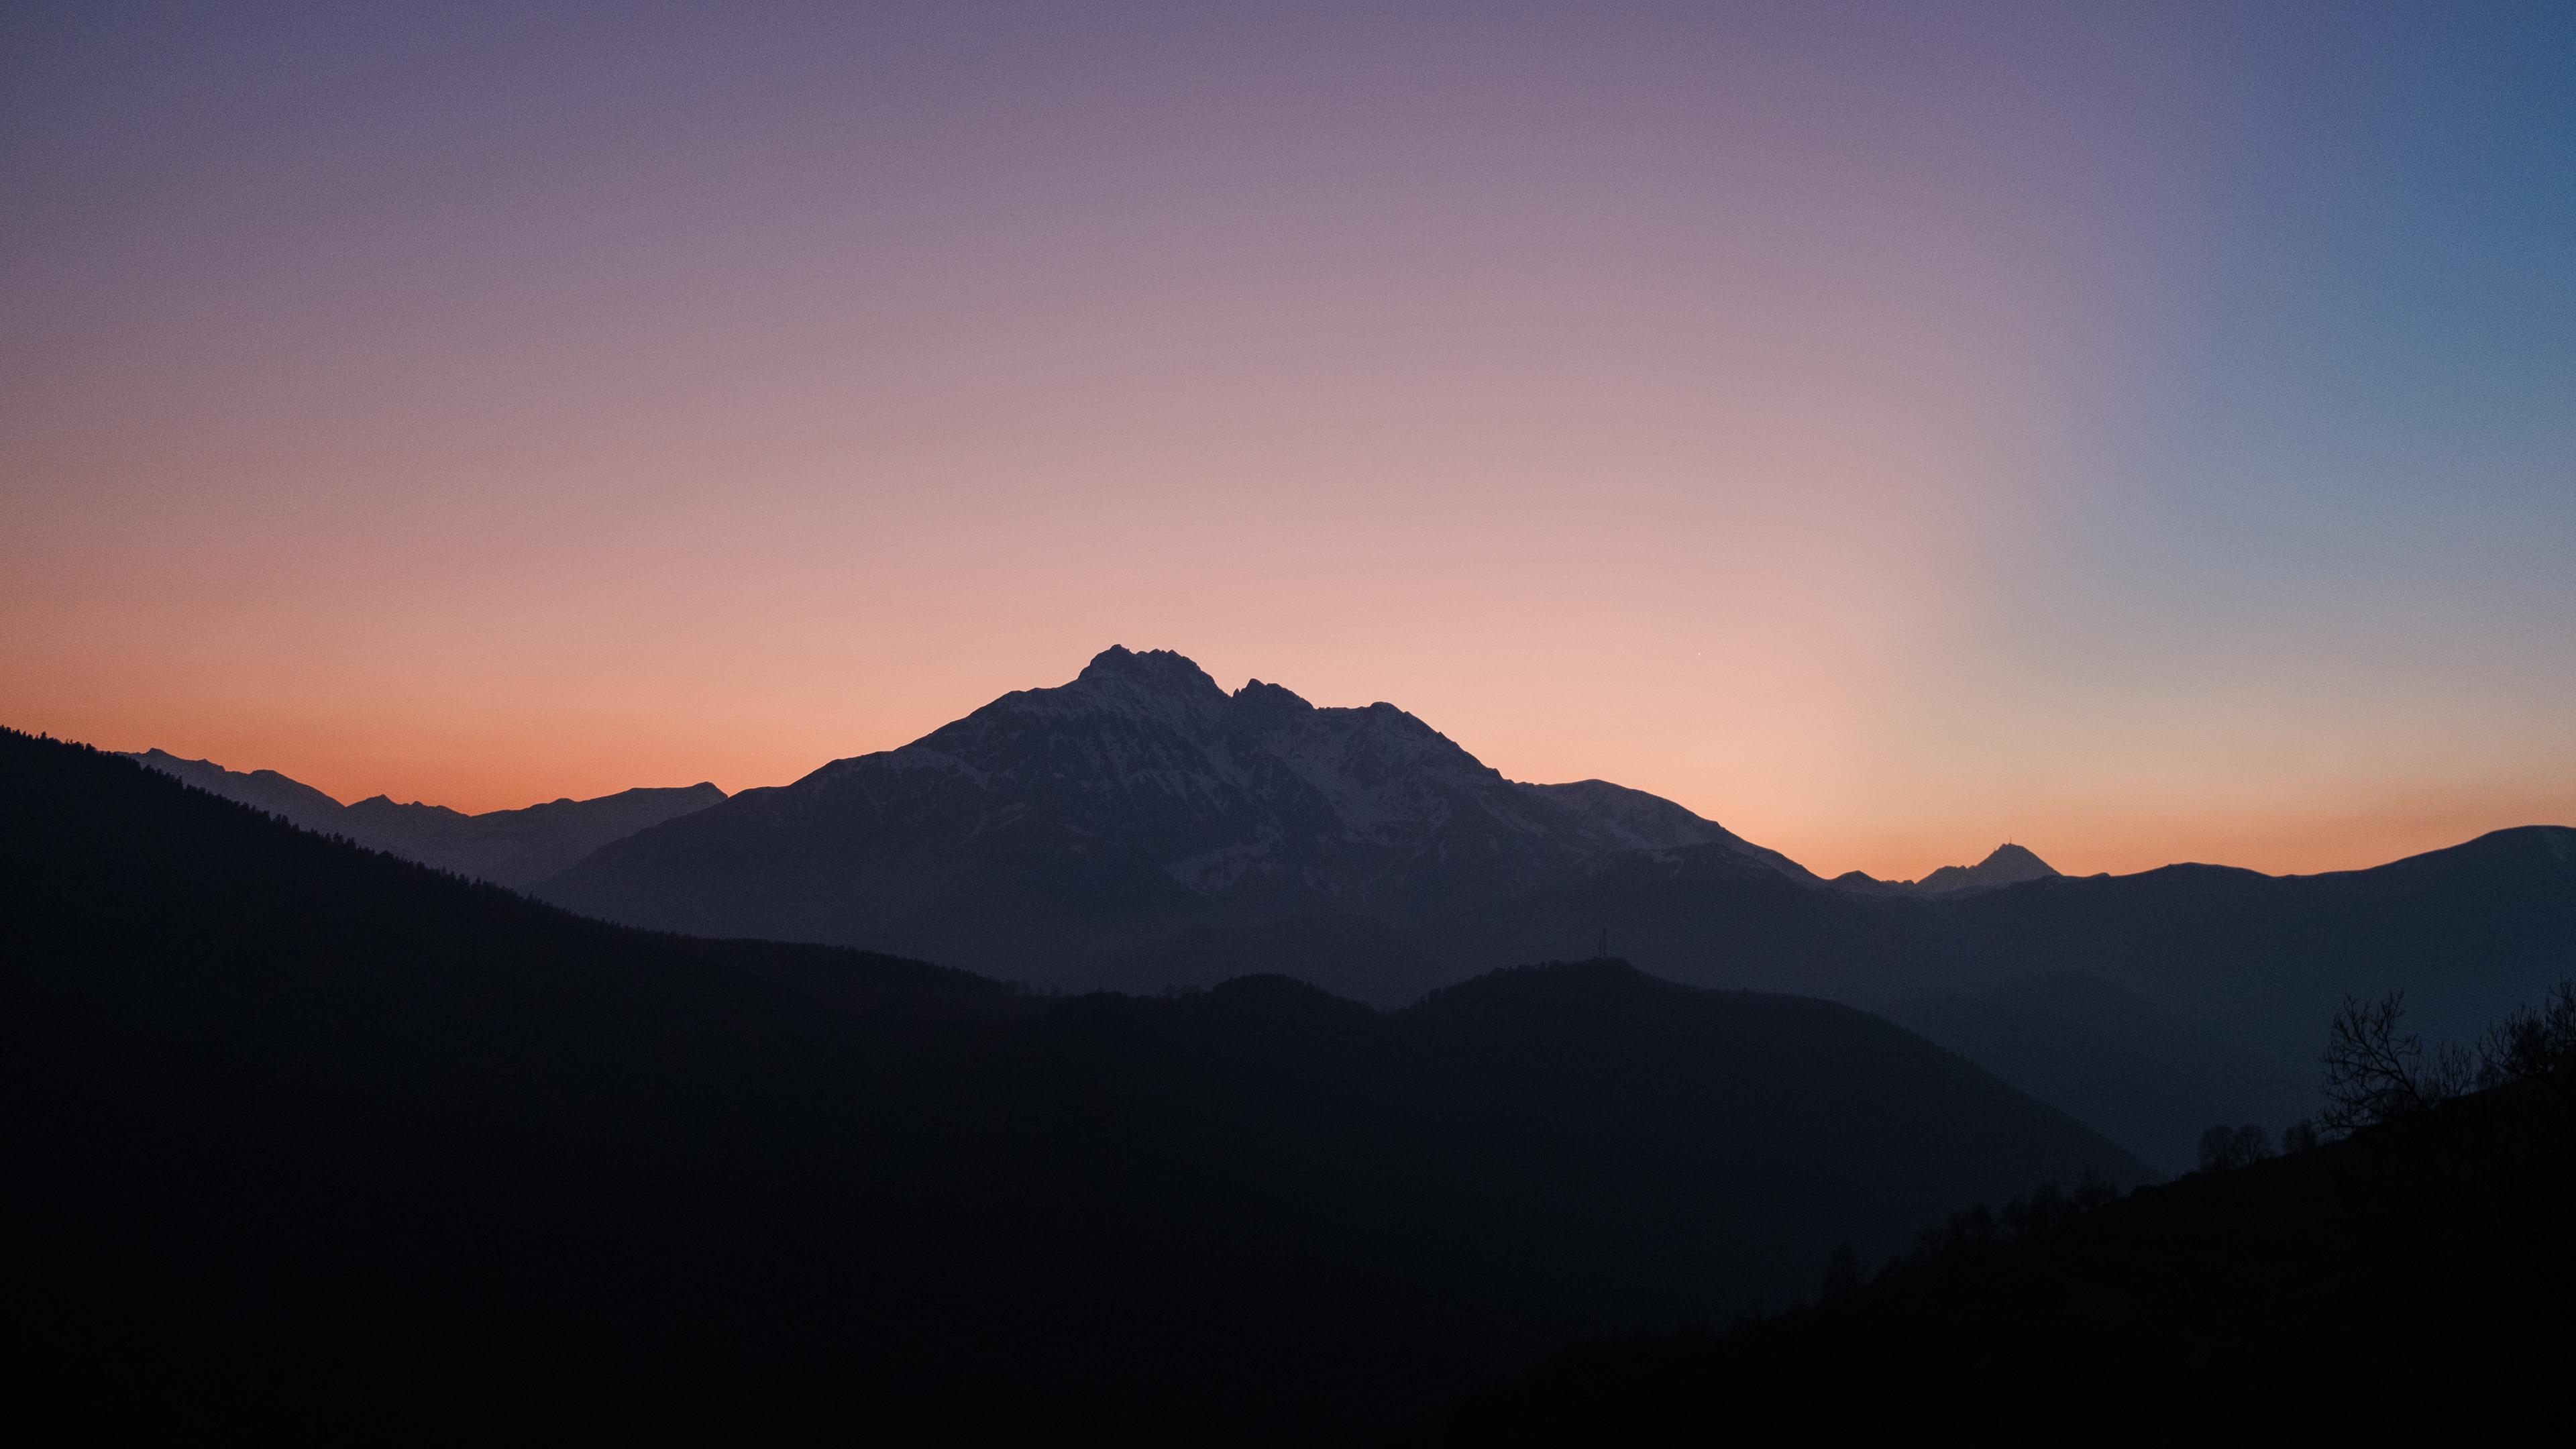 Mountains Sunset Clean Skyline Mist 3840x2400 Wallpaper